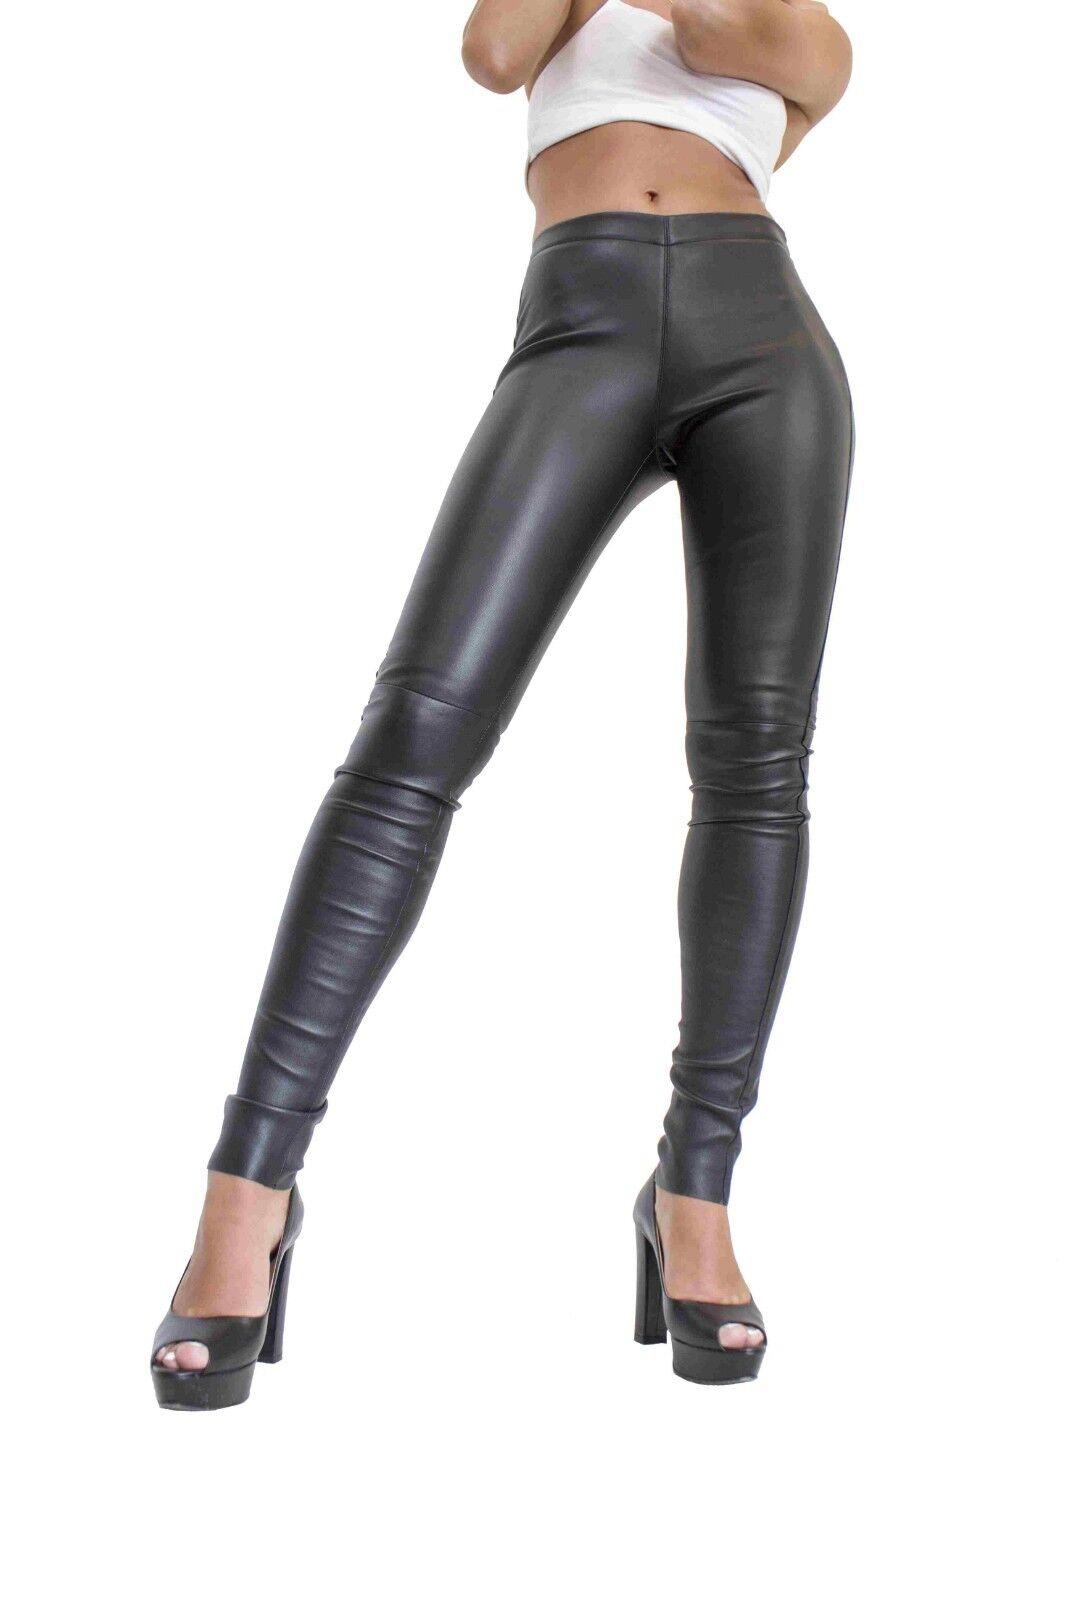 Donna Lederhose Lammnappa Pelle Pelle Pelle Leggings echt Leder Slimfit TIGHT PANTS NERO 26bc46